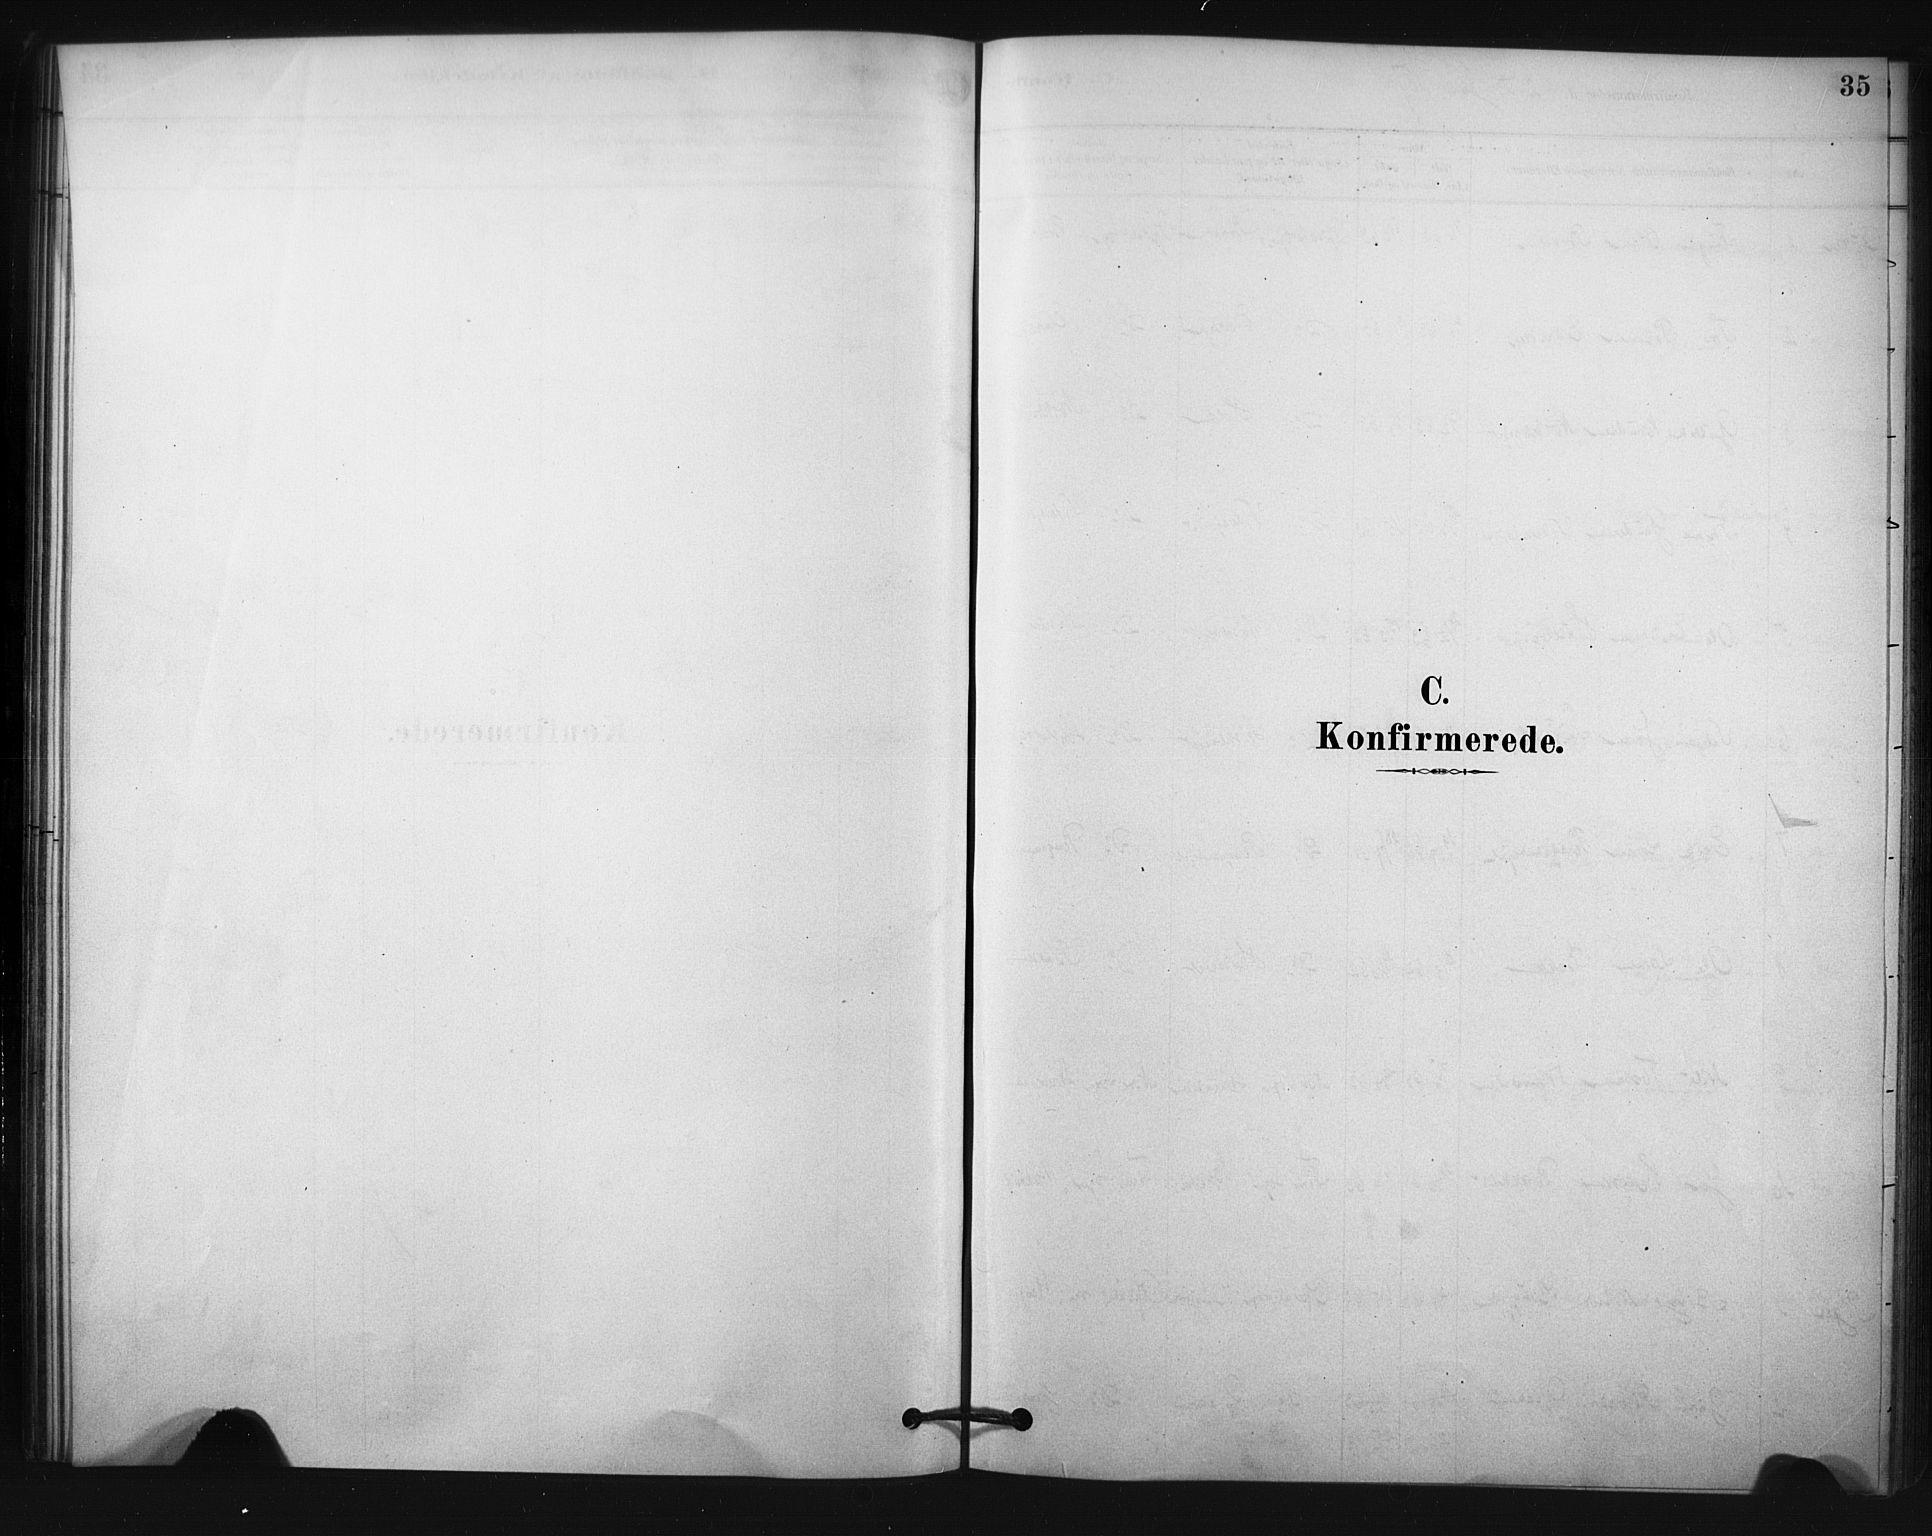 SAKO, Nore kirkebøker, F/Fc/L0003: Ministerialbok nr. III 3, 1878-1884, s. 35